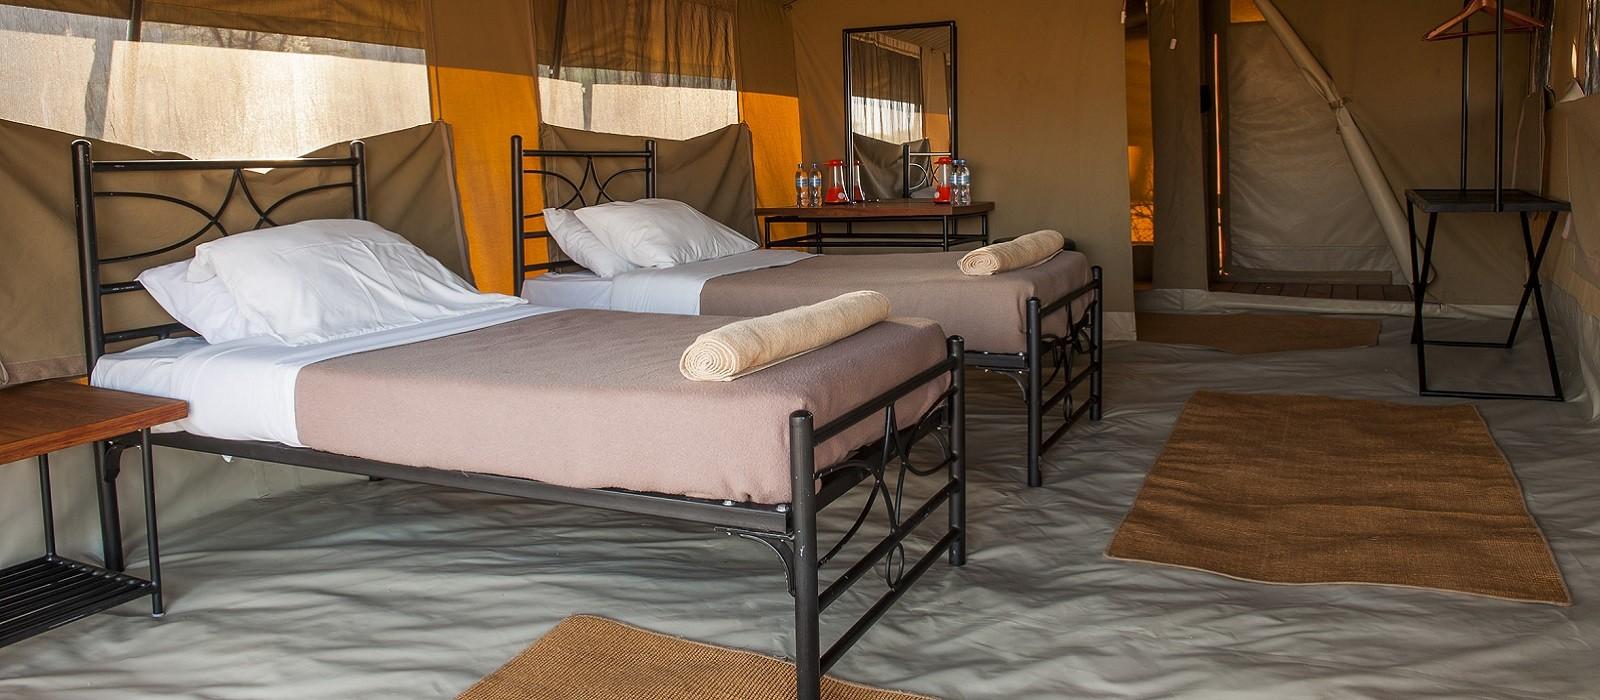 Hotel Ndutu Kati Kati Tented Camp Tansania